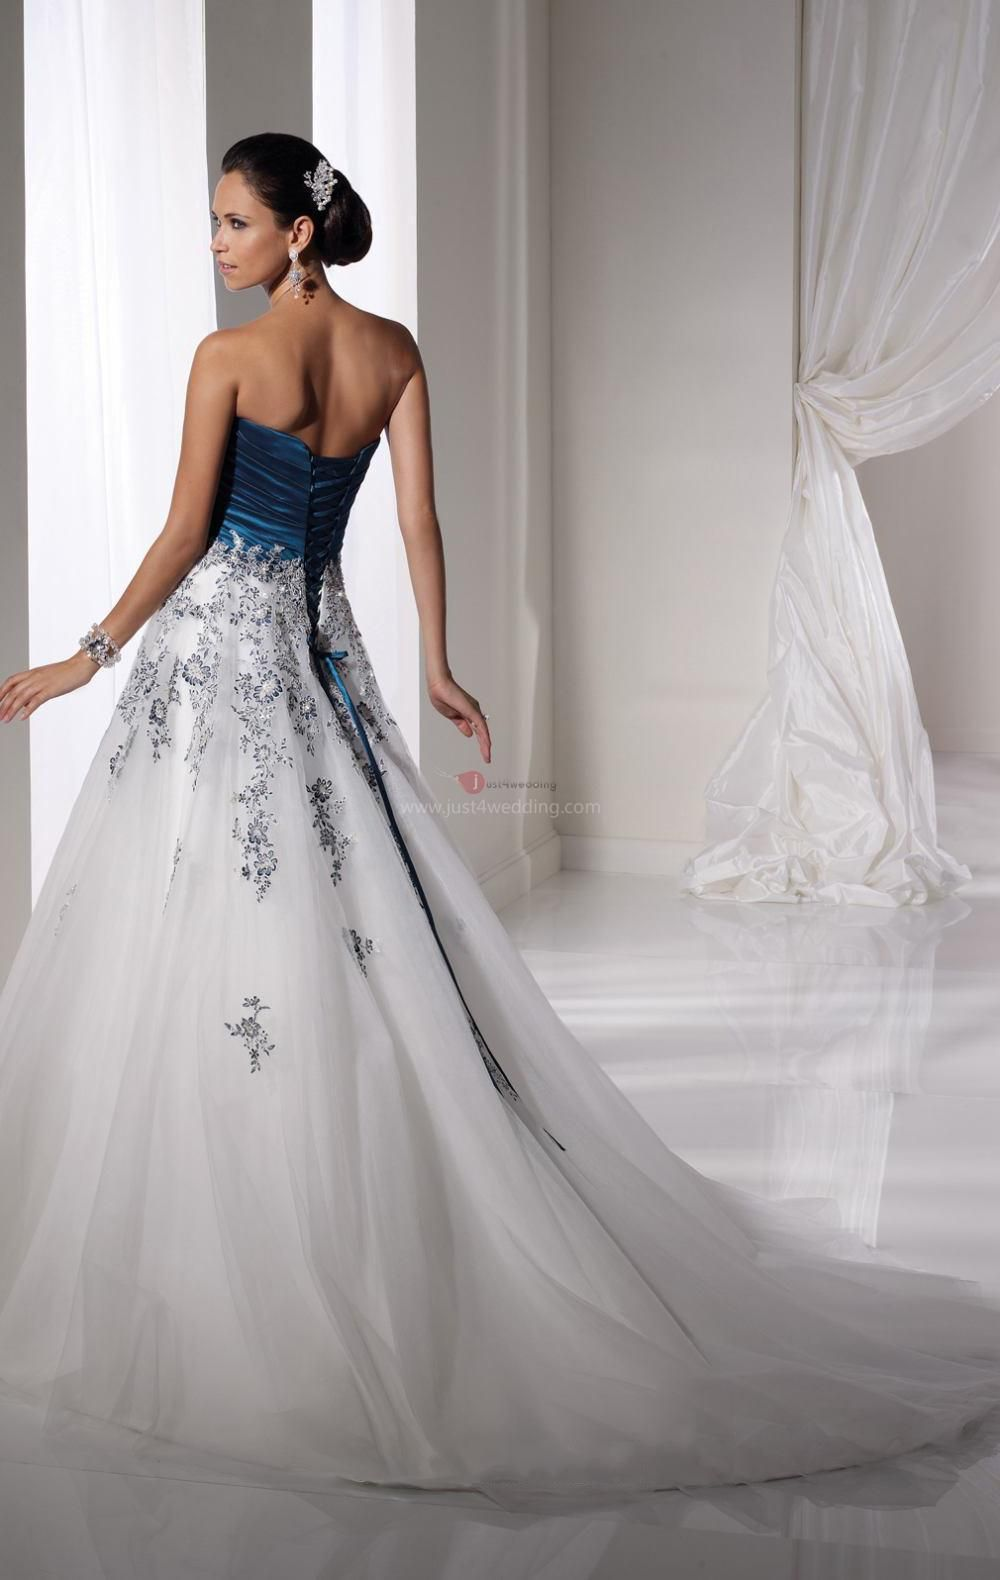 Tall white and blue wedding dress blue wedding dresses for Tall dresses for weddings